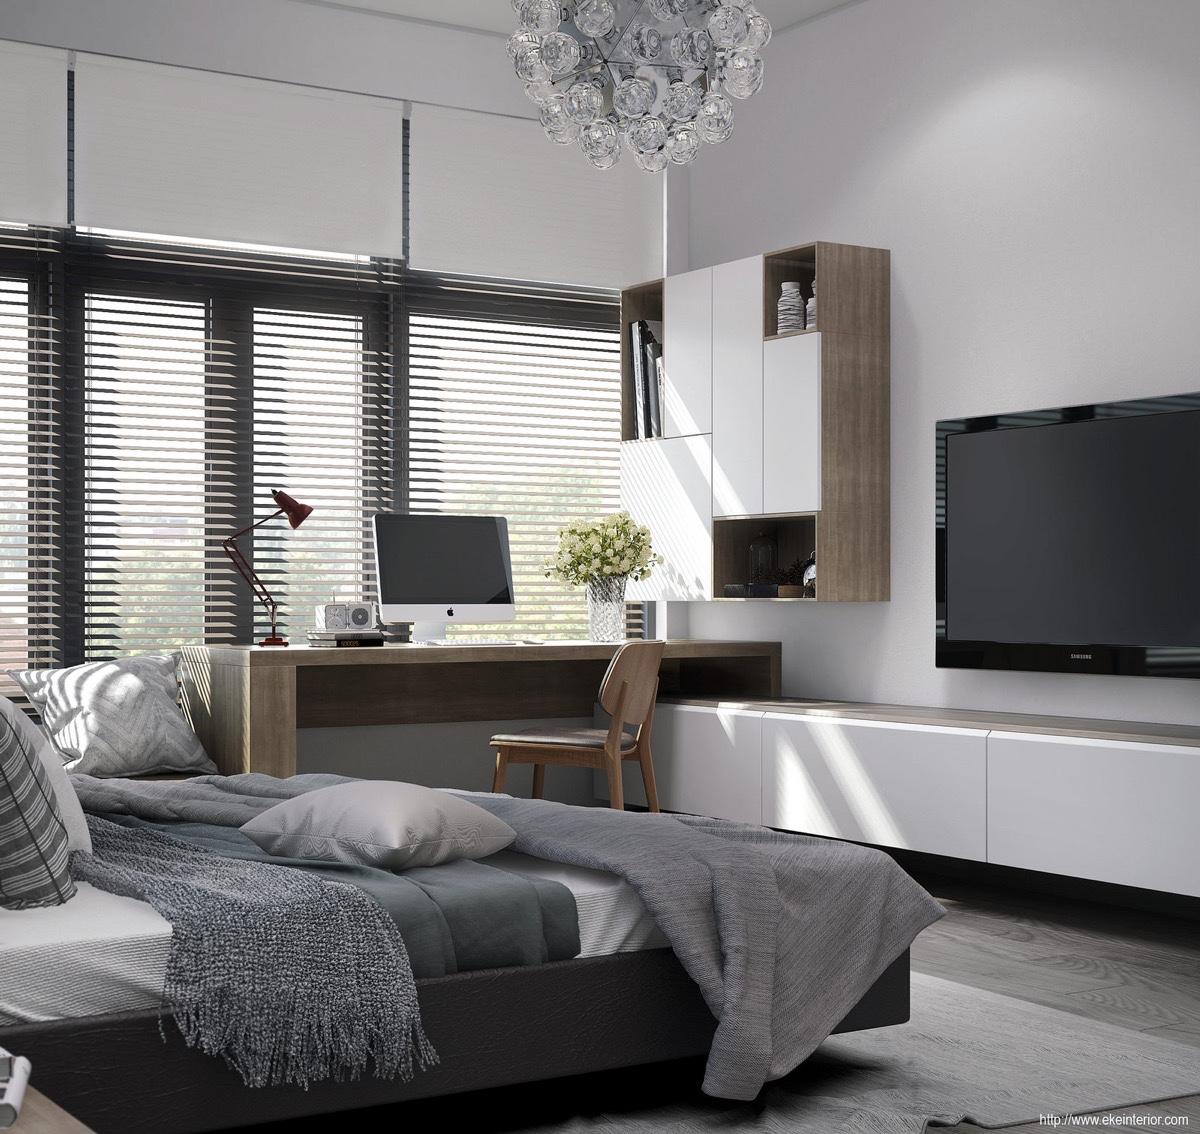 desain interior kamar tidur sederhana%2B9